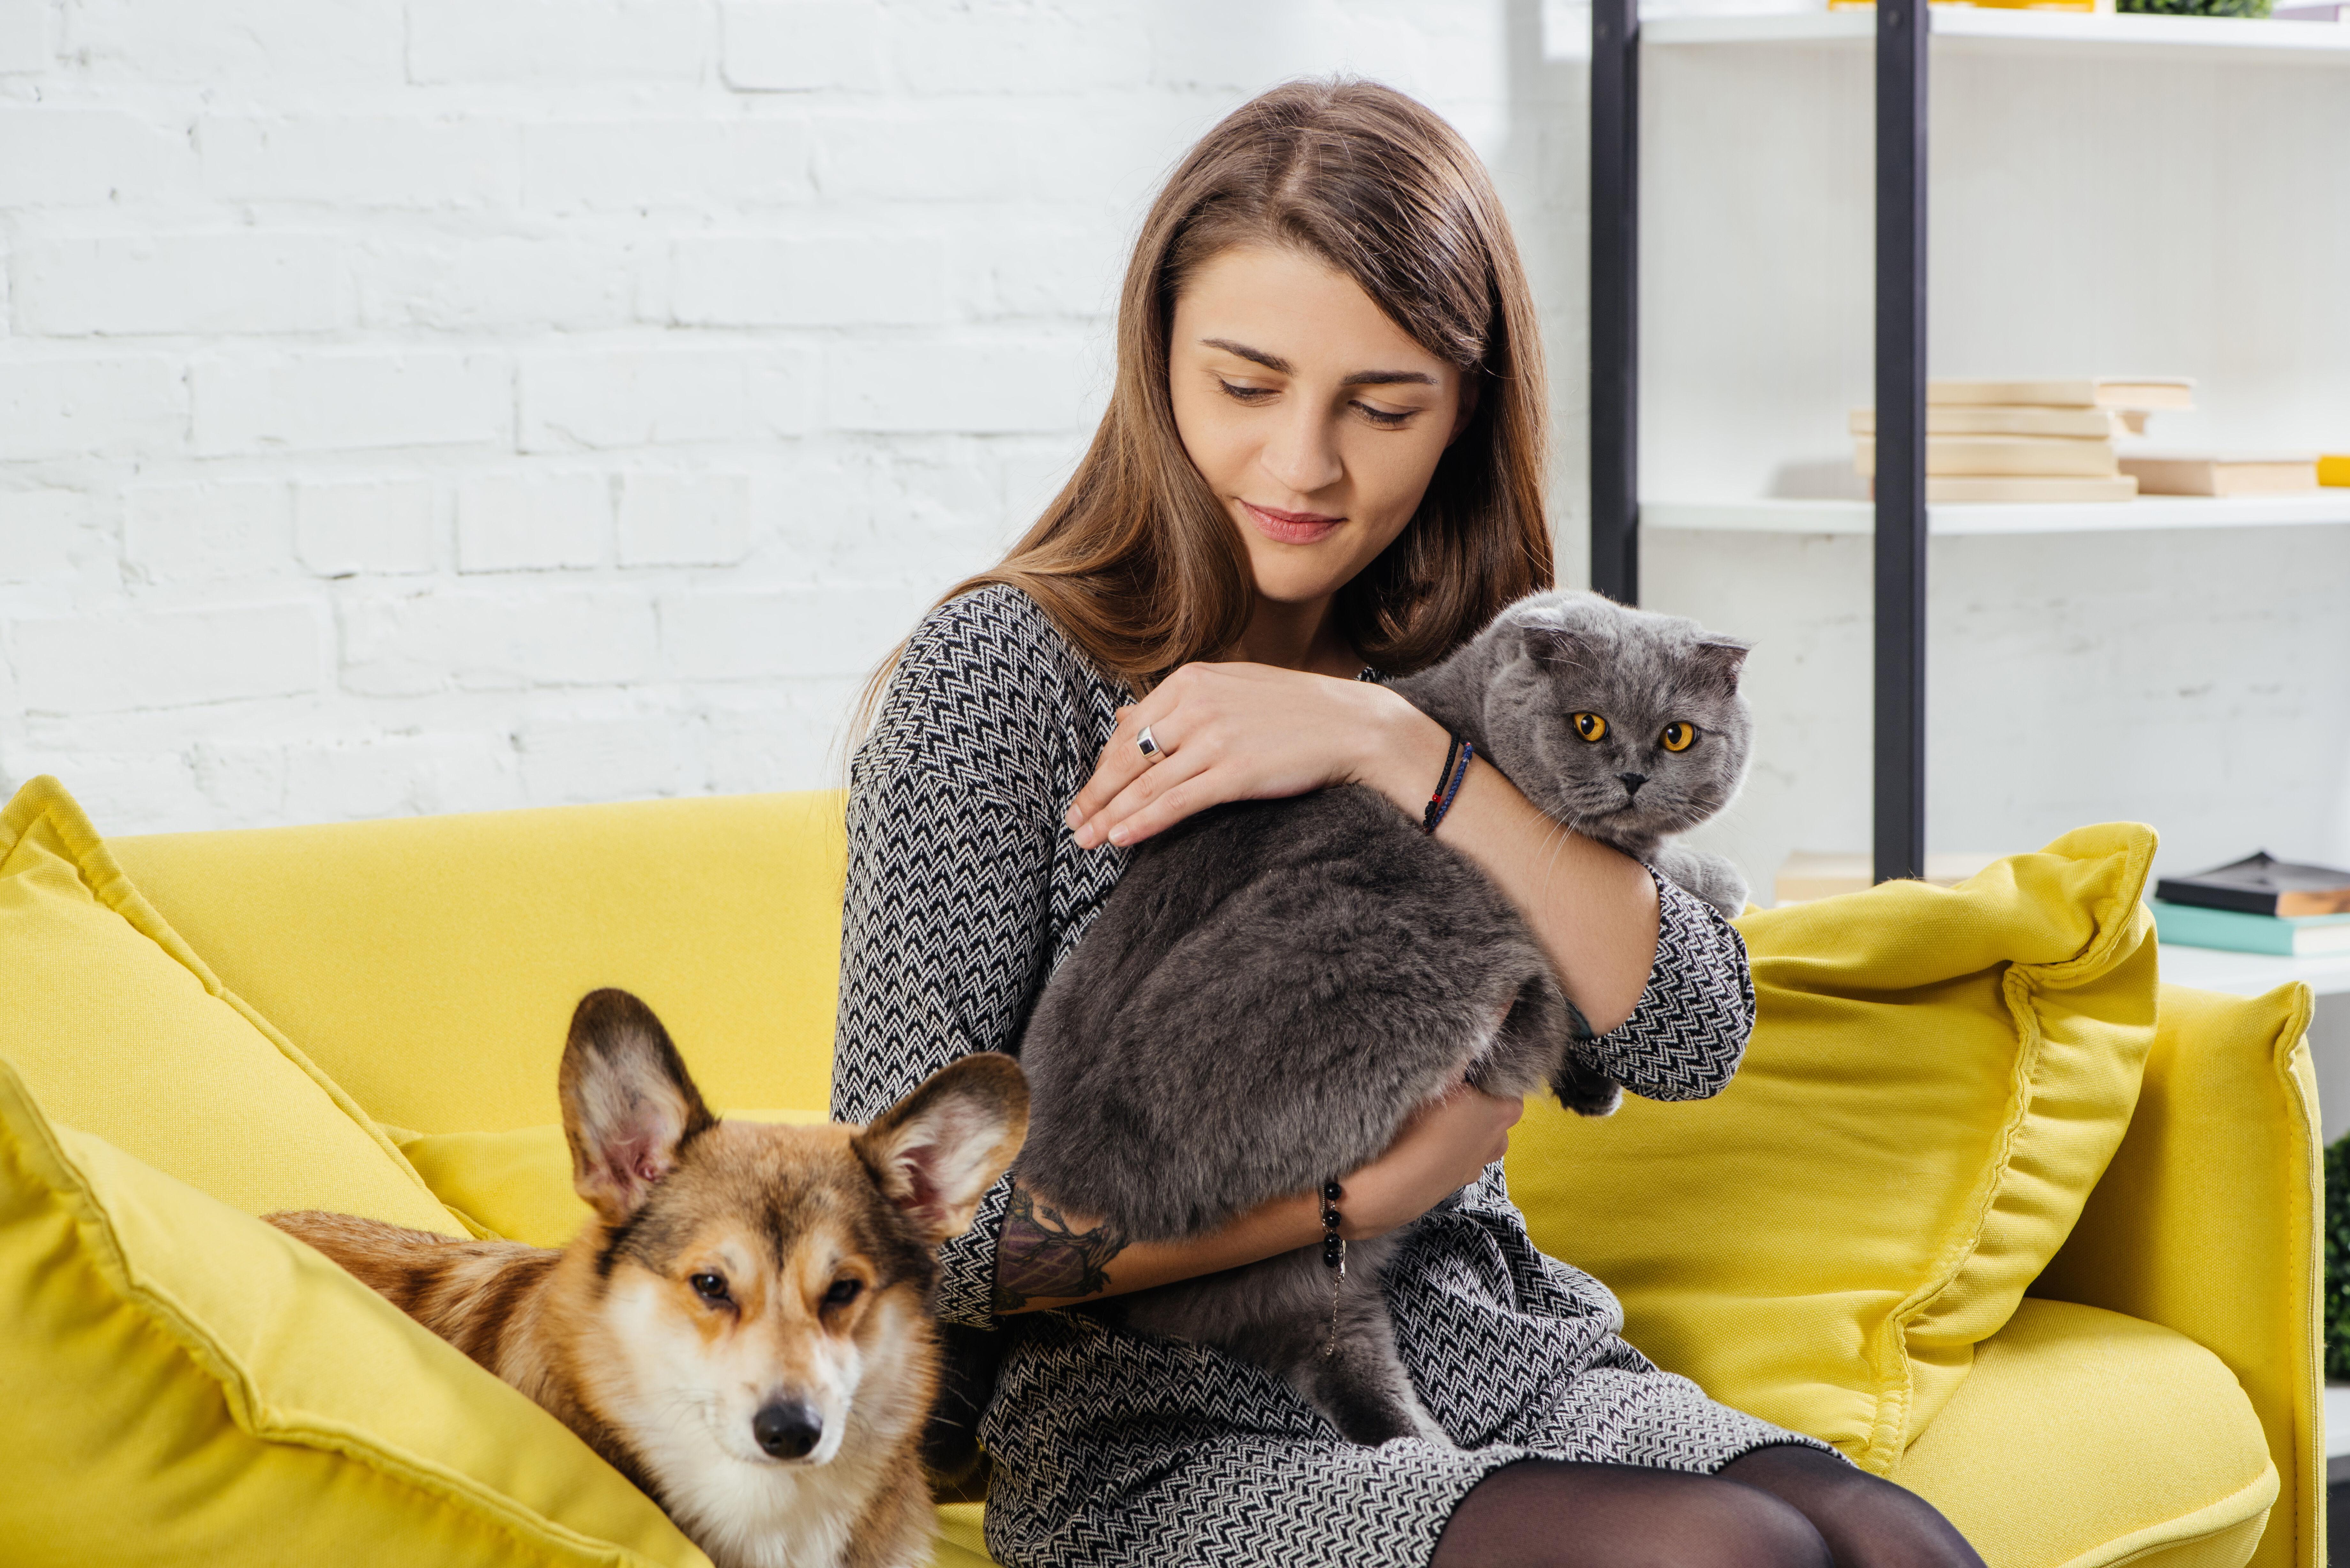 Woman holding cat near dog